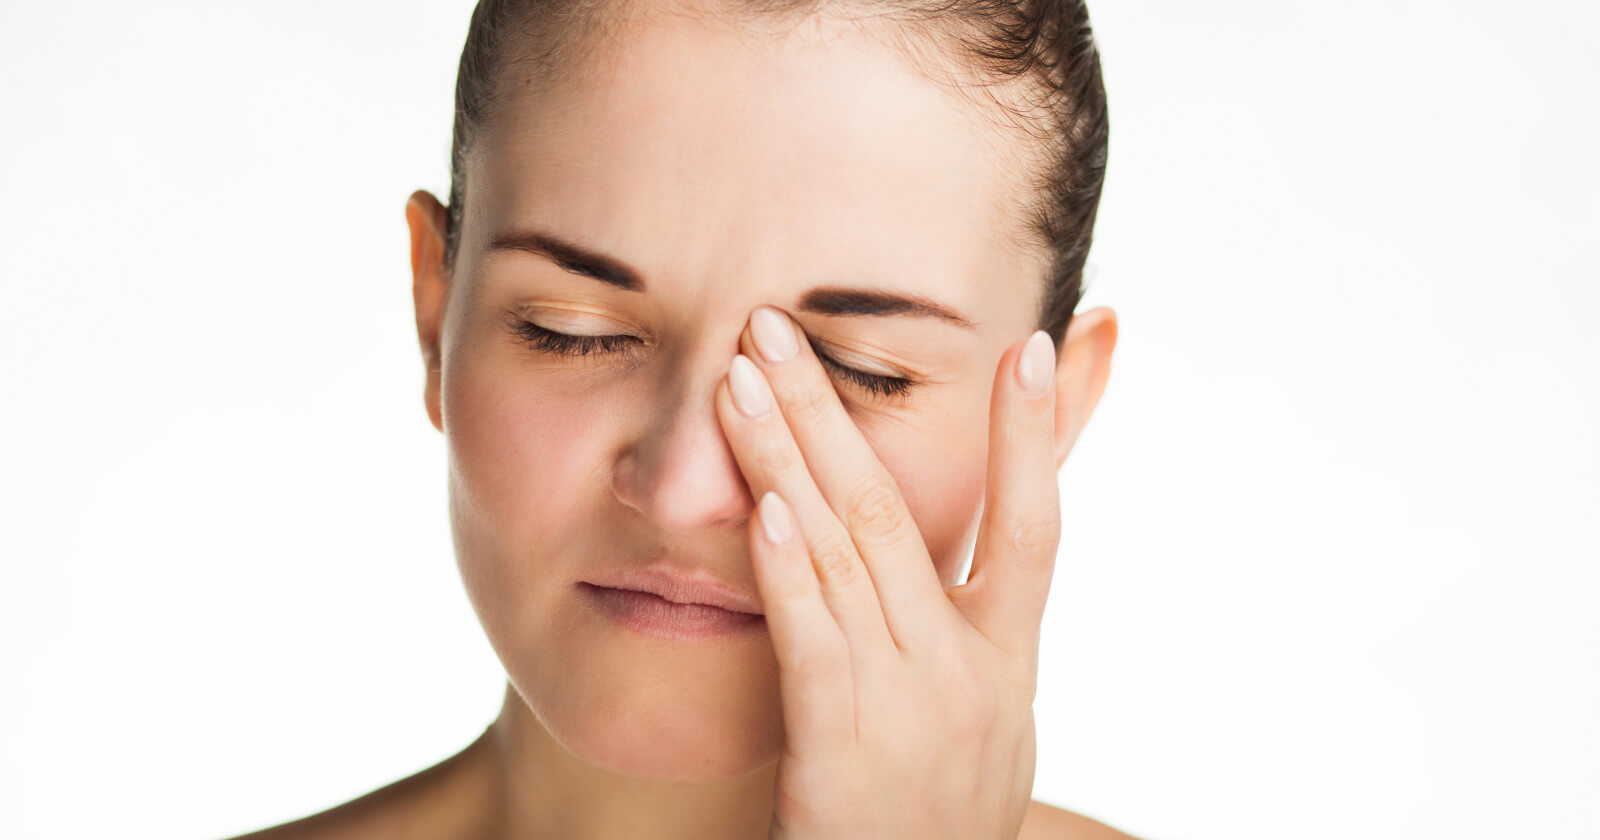 Gereizt symptome trigeminusnerv Symptome eines